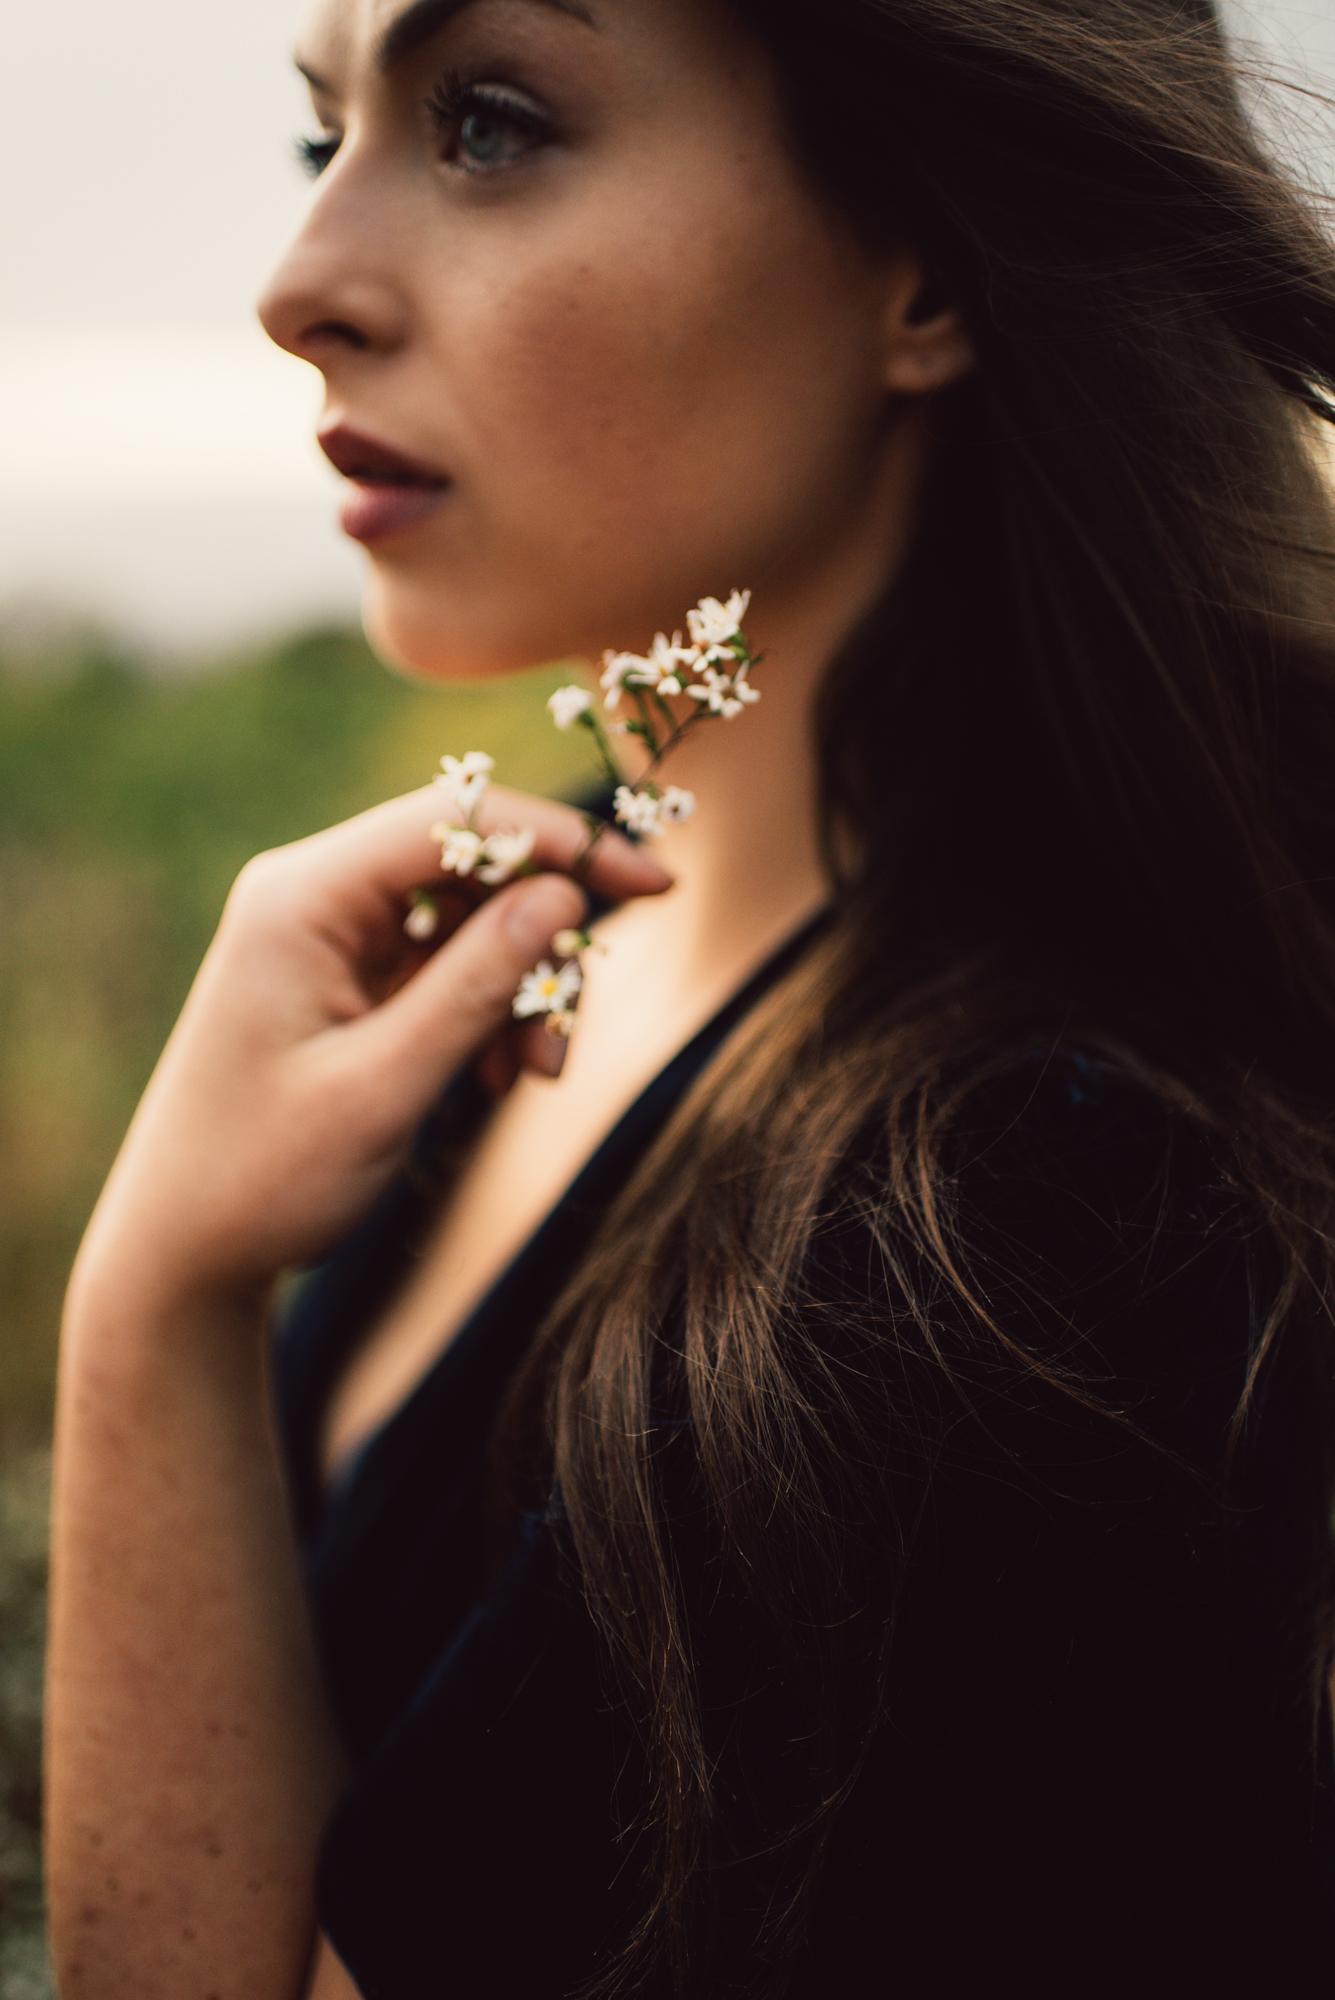 Megan_Shenandoah_National_Park_Windy_Romantic_Portraits_166.JPG